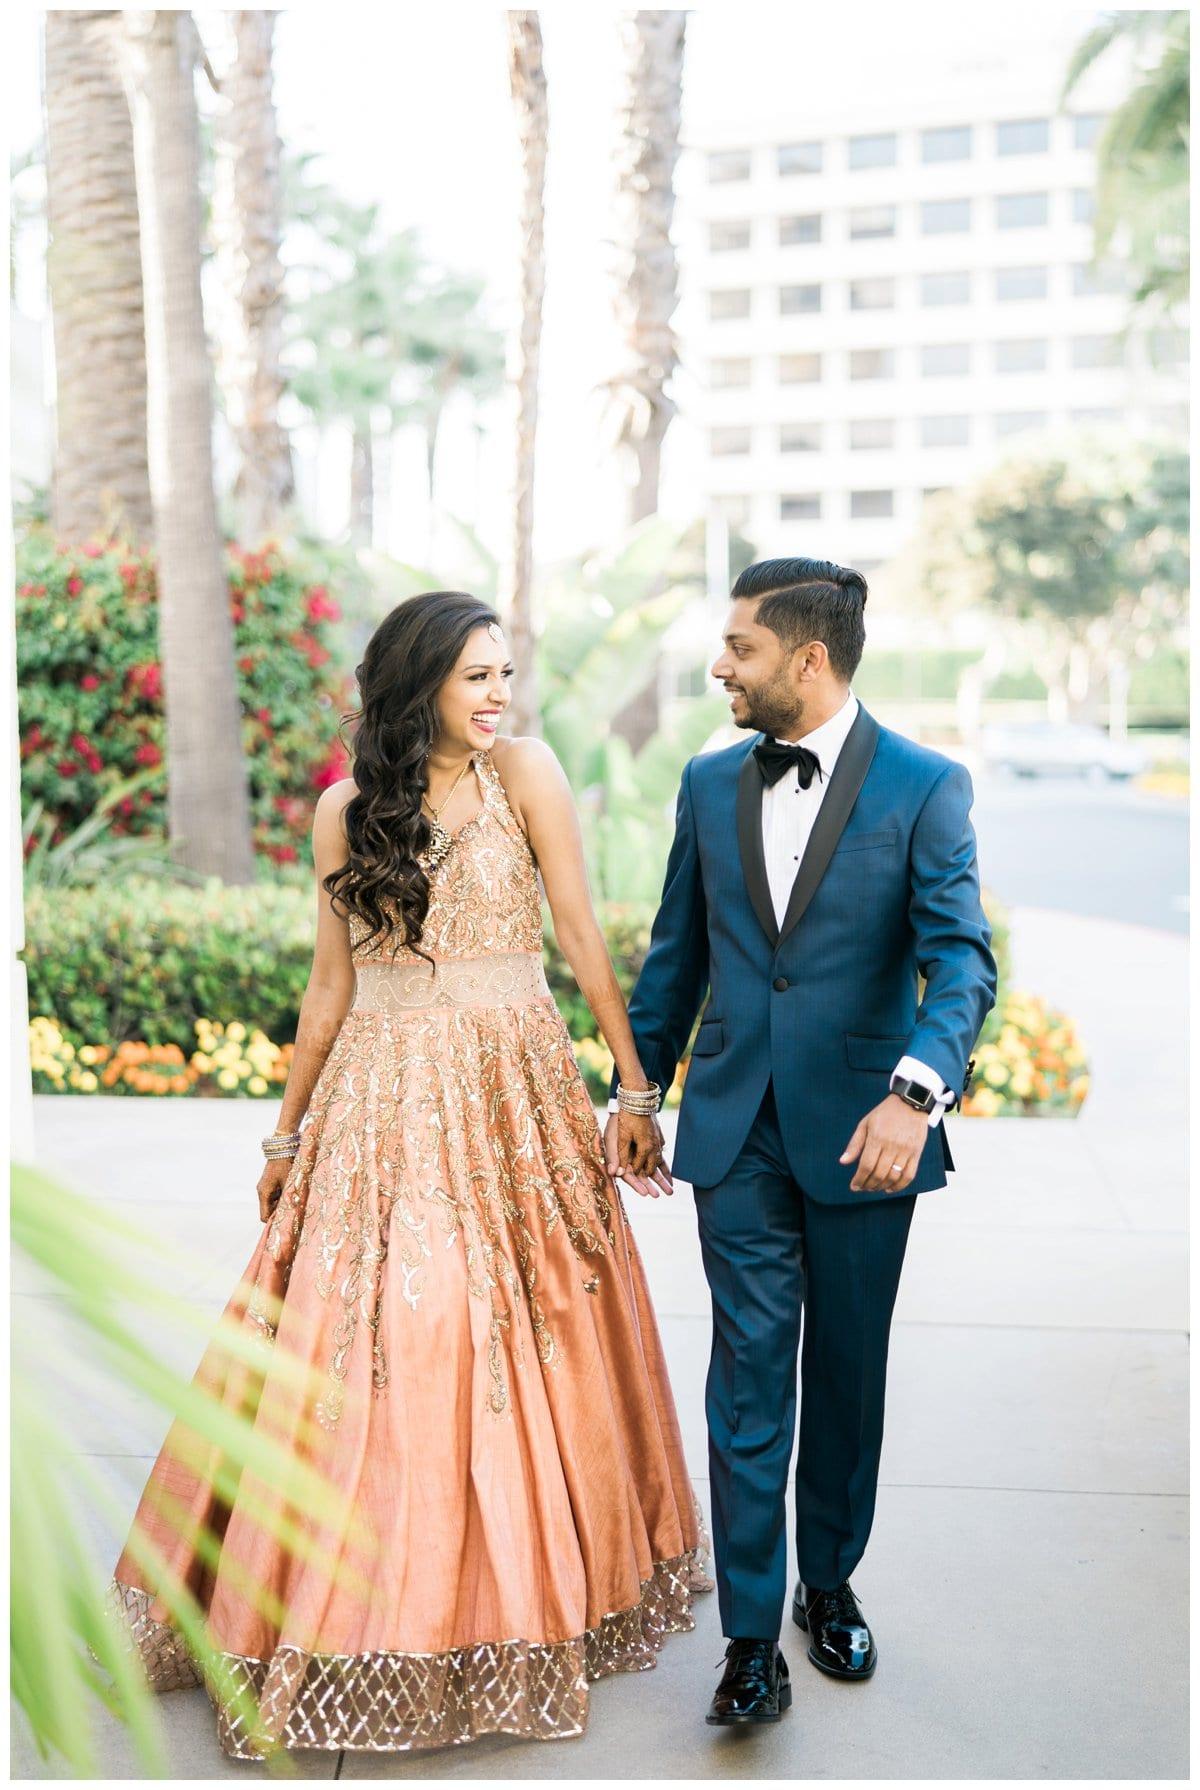 Hotel-Irvine-Indian-Wedding-Carissa-Woo-Photography_0075.jpg